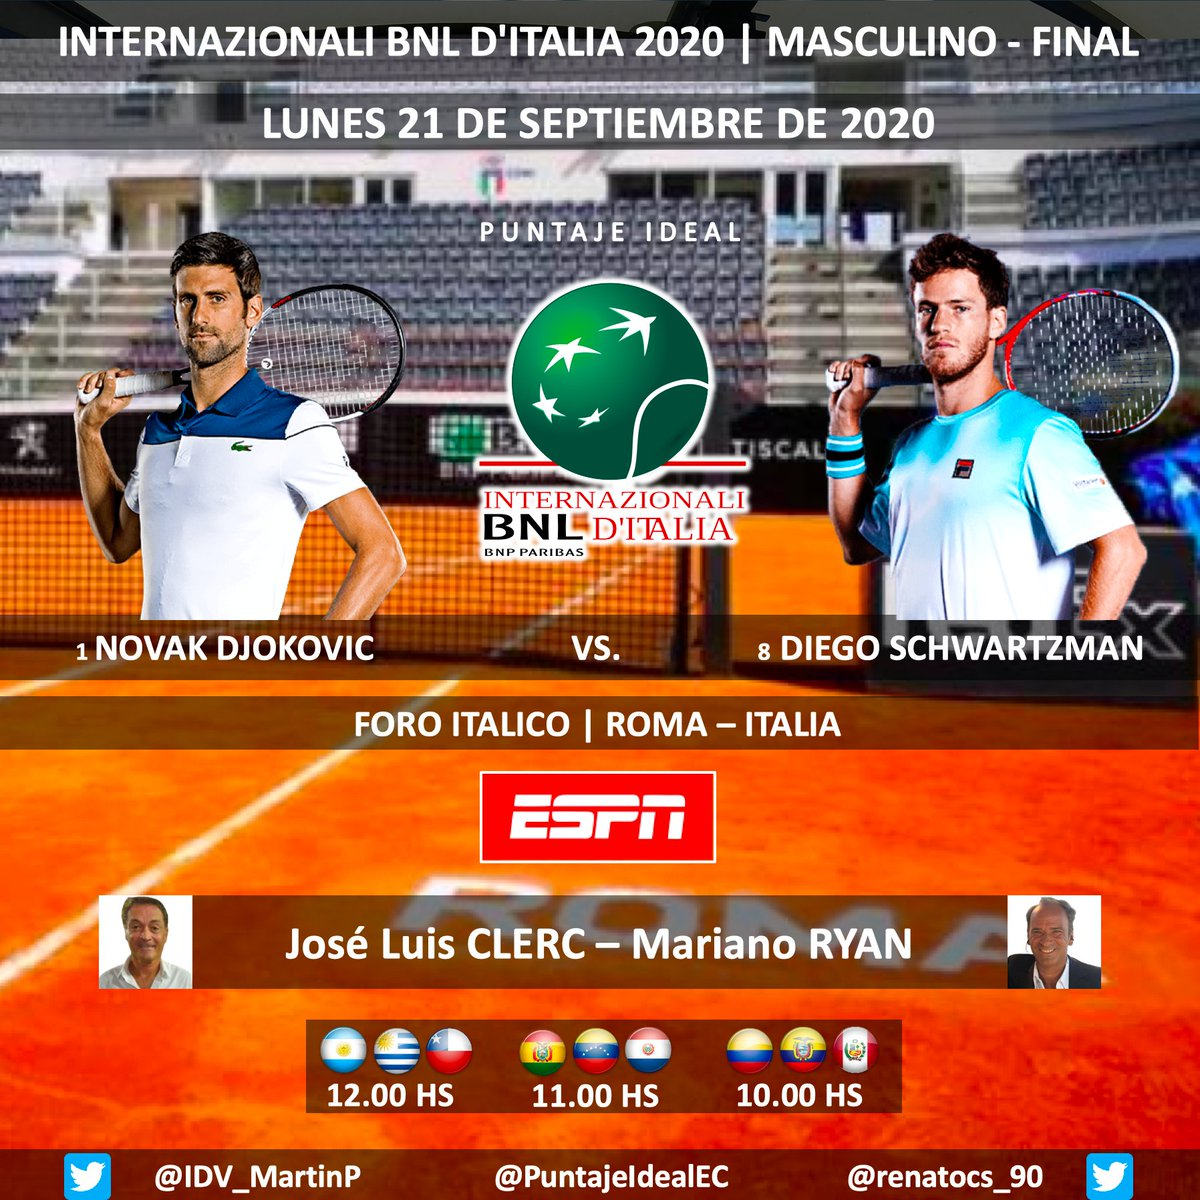 🎾 #IBI20 🇮🇹 | Final - Masculino 🇷🇸 #Djokovic vs. #Schwartzman 🇦🇷  🎙 Relatos: @JoseLuisClerc  🎙 Comentarios: @marianoryan 📺 #ESPN Sudamérica  💻📱 @ESPNPLAY Sudamérica  🤳 #TENISxESPN  Dale RT https://t.co/z0uiUCdQoJ